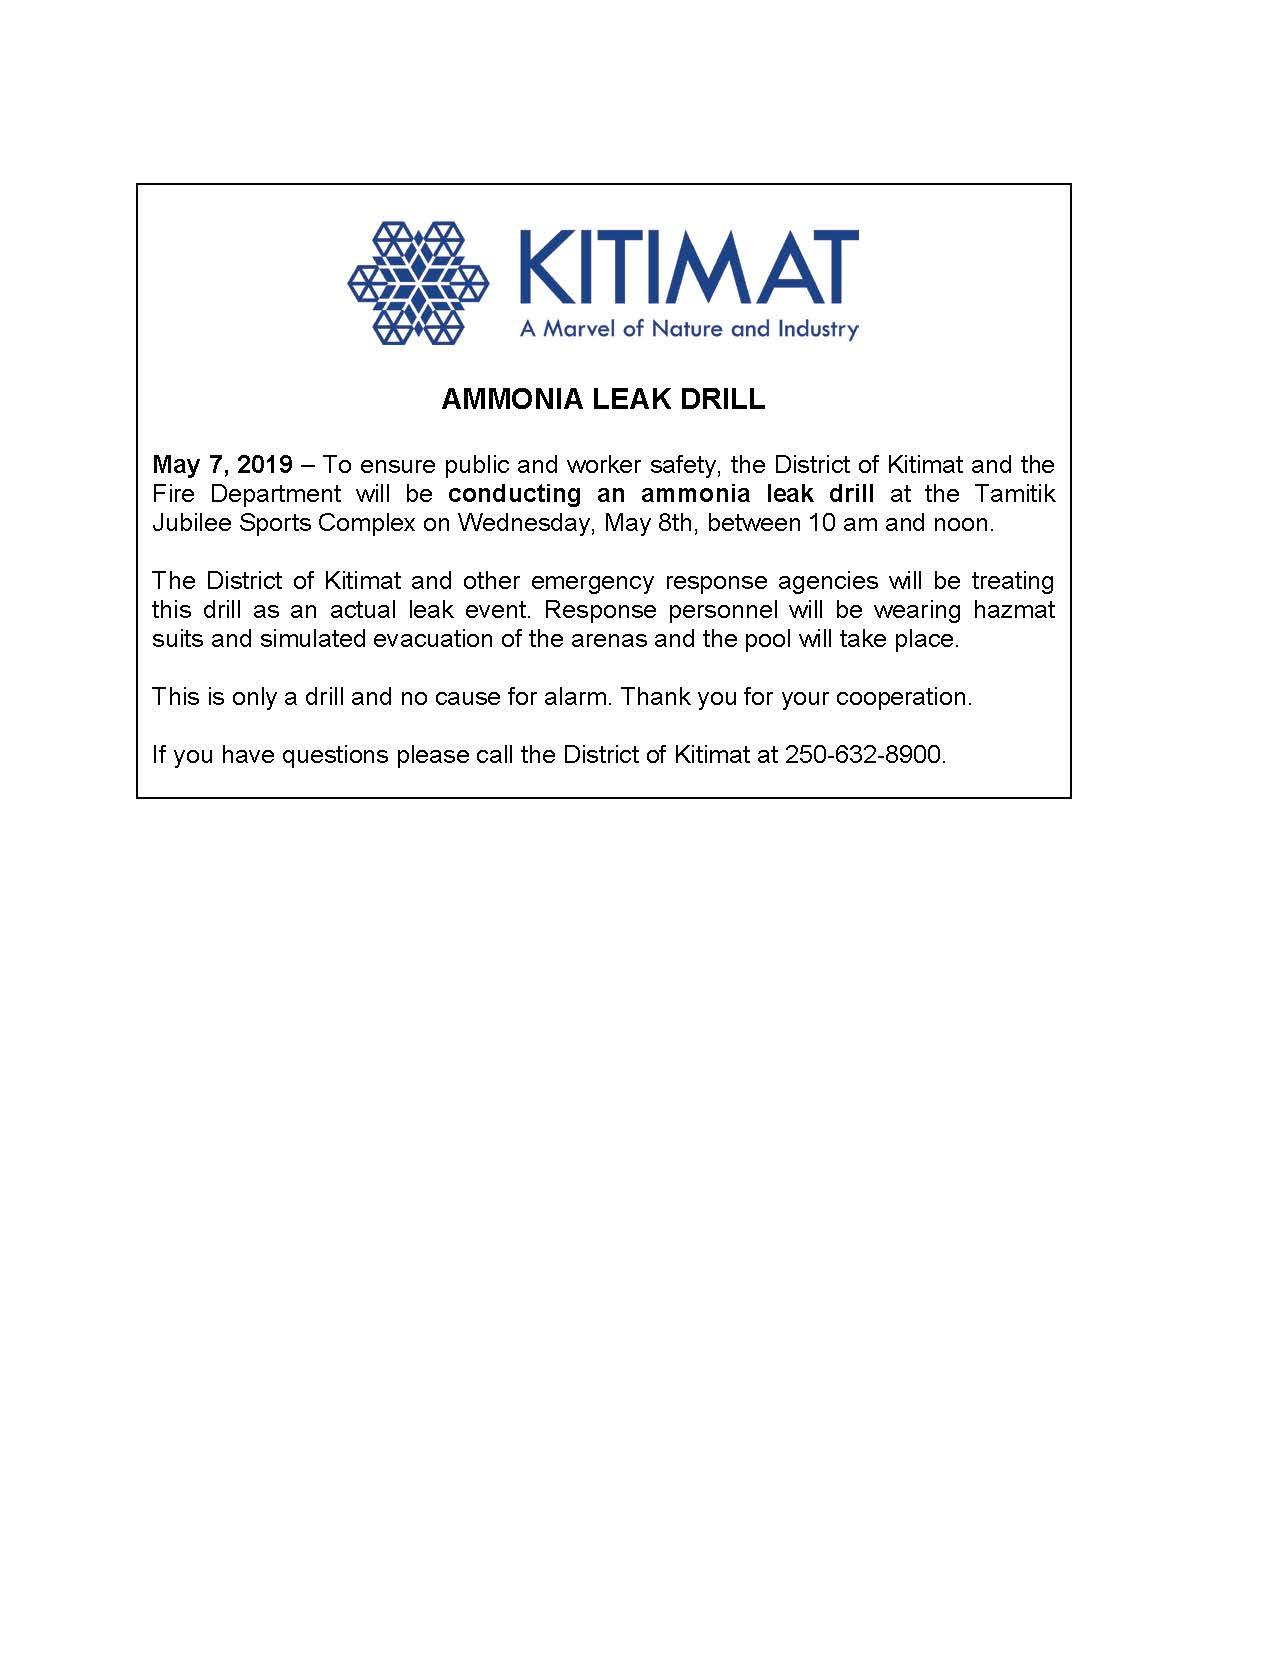 Ammonia Leak Drill